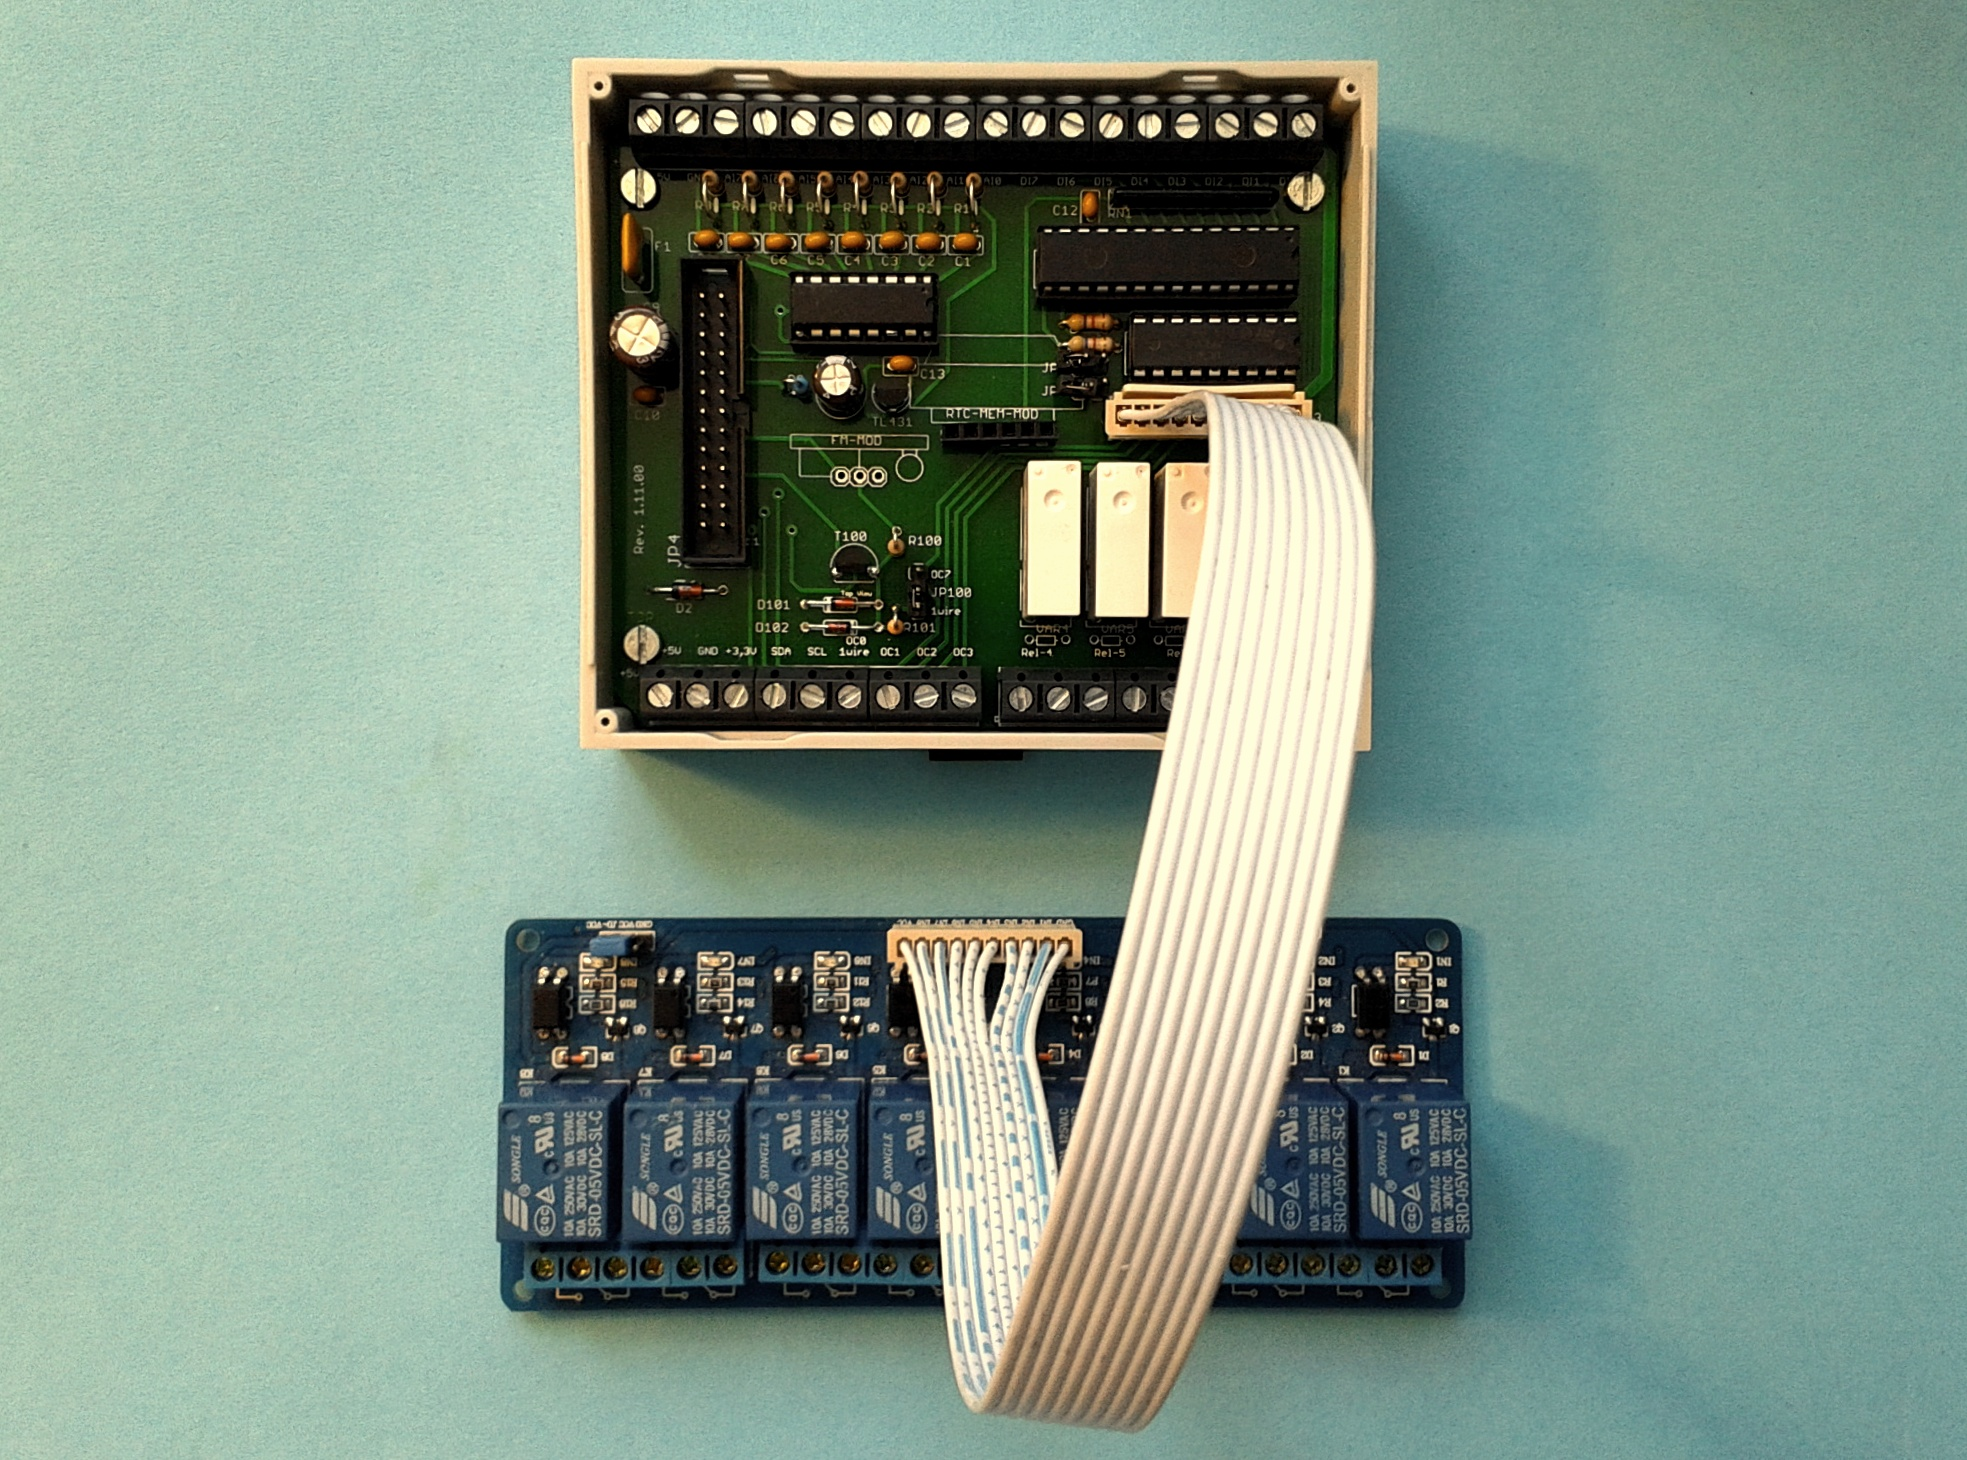 Raspberry Pi Io Erweiterung 1wire Analog Digital Relais I2c Wiringpi Mcp3008 C Bild 2 Hubo Mit Lastrelaisoption